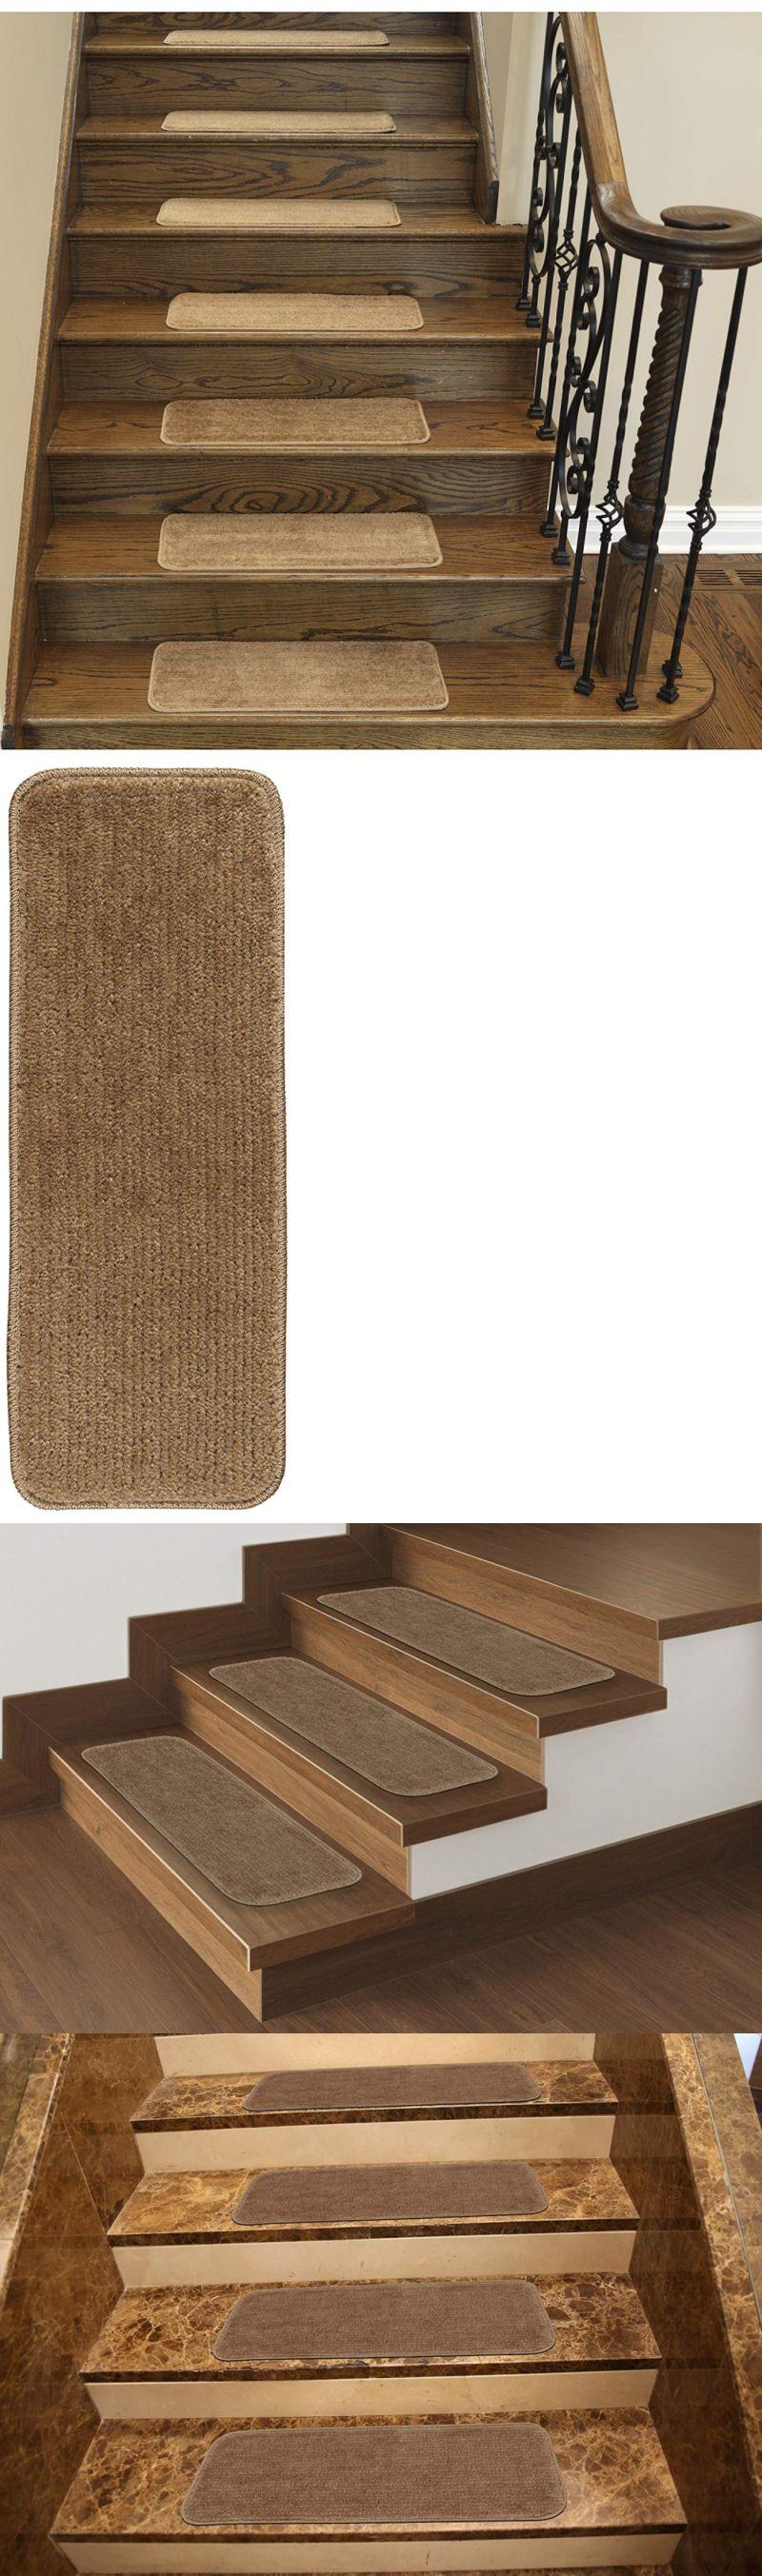 Best Stair Treads 175517 Ottomanson Softy Stair Tread 9 X 26 400 x 300